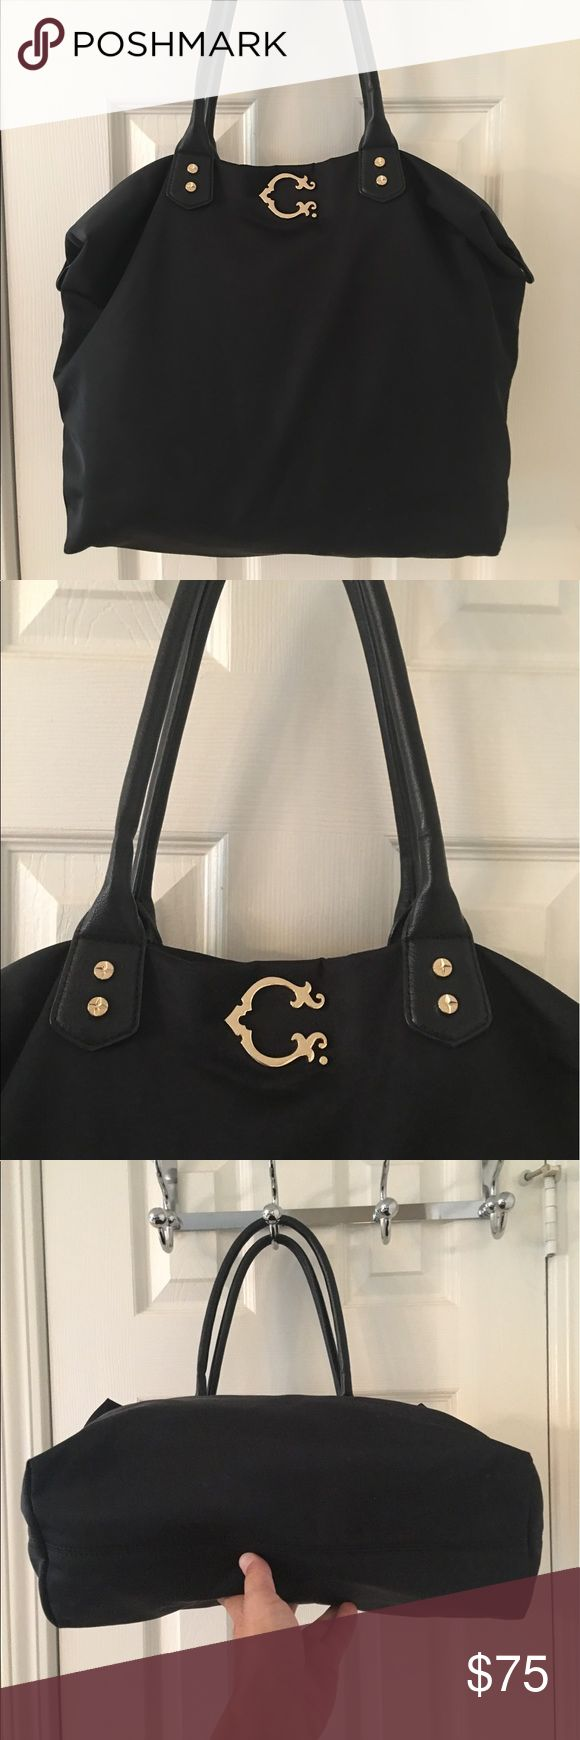 🛍 C. Wonder Black Nylon Tote Bag Good condition.  Nylon bag. C. Wonder Bags Totes